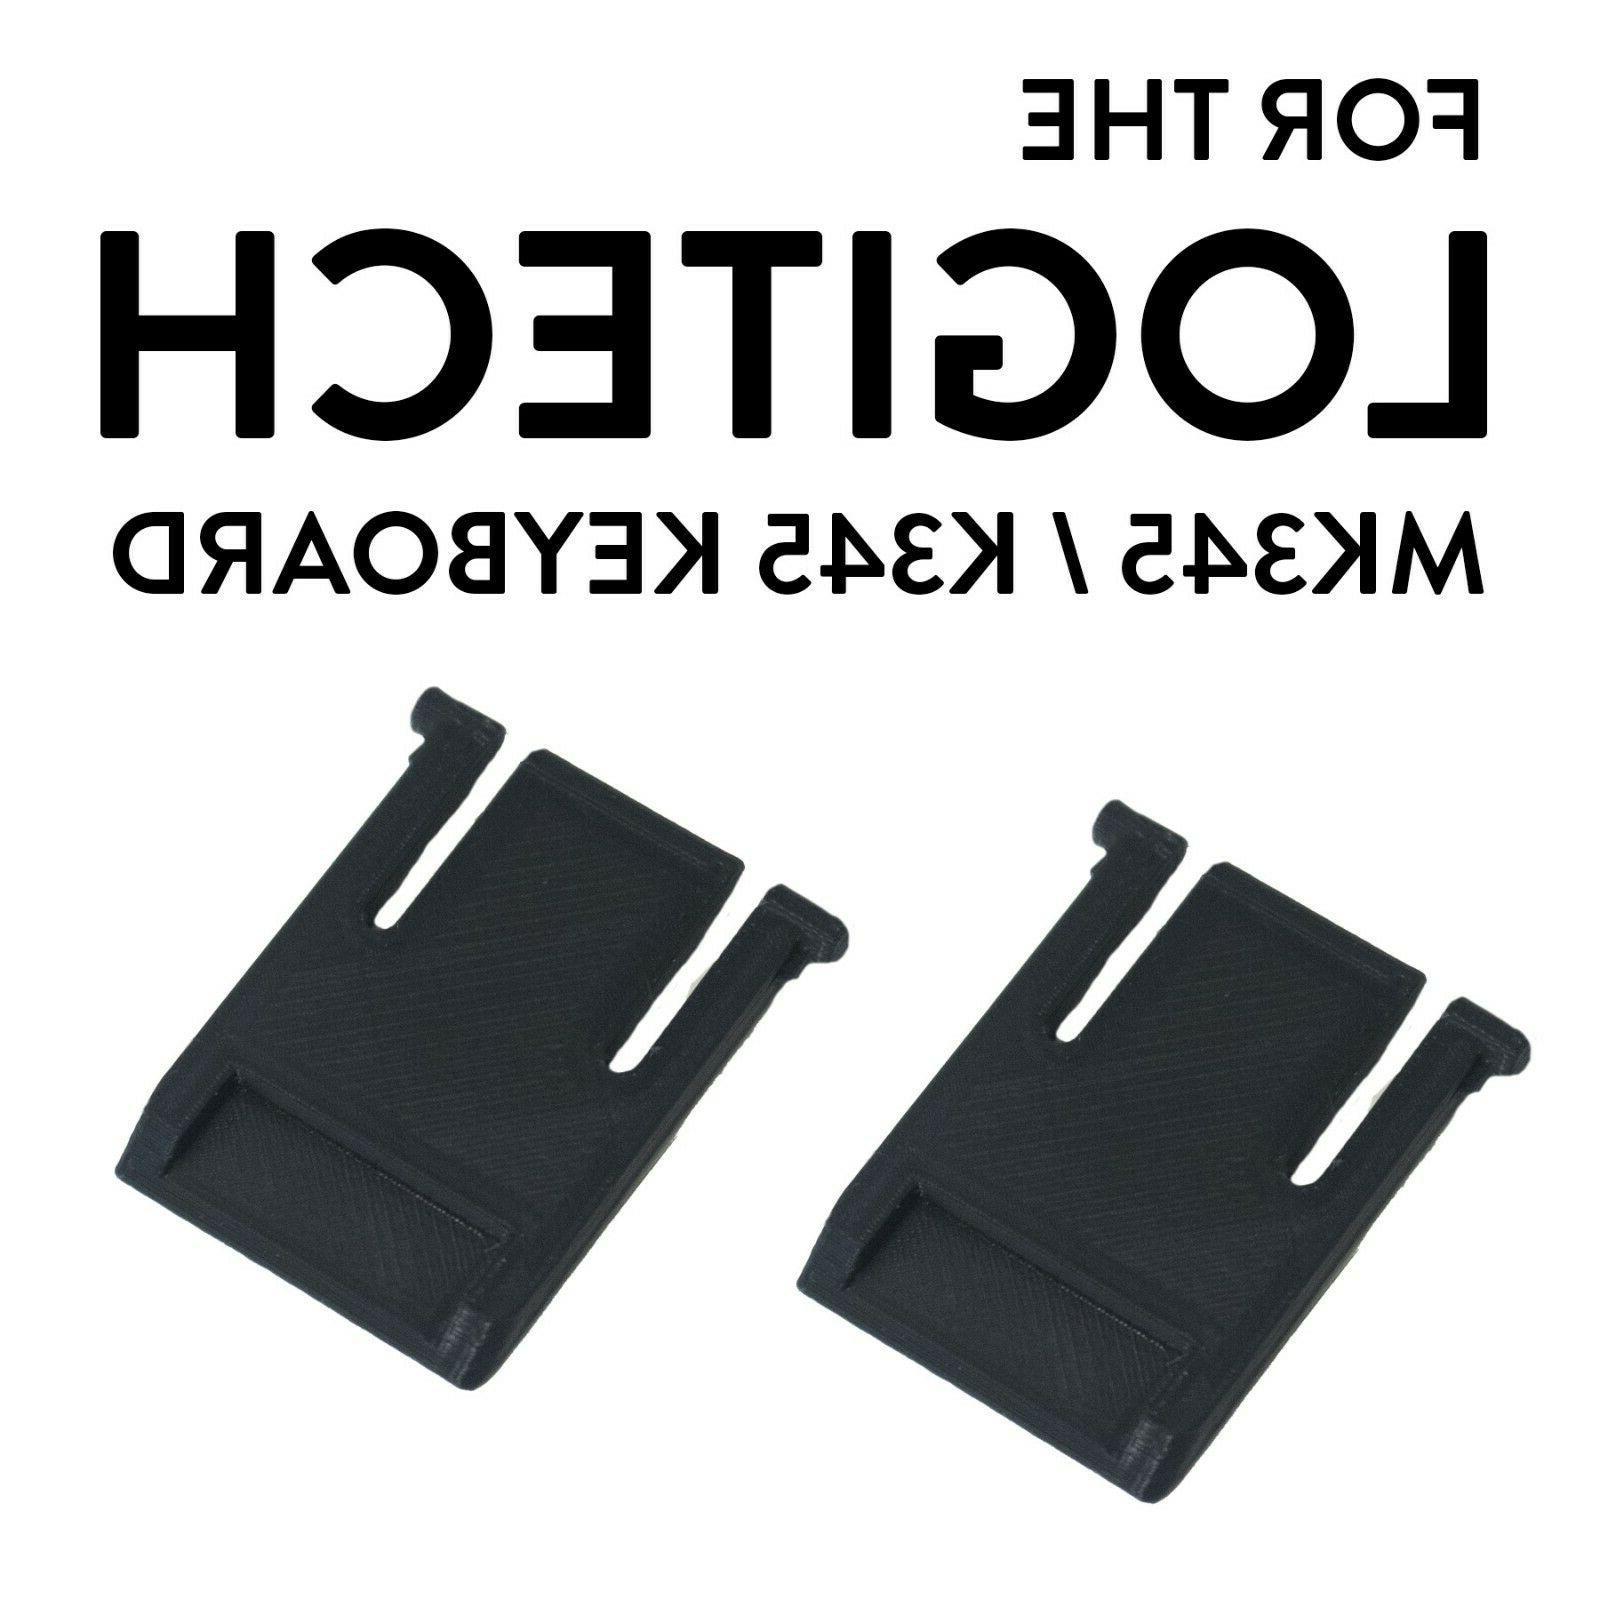 2pcs k345 mk345 keyboard tilt foot replacement